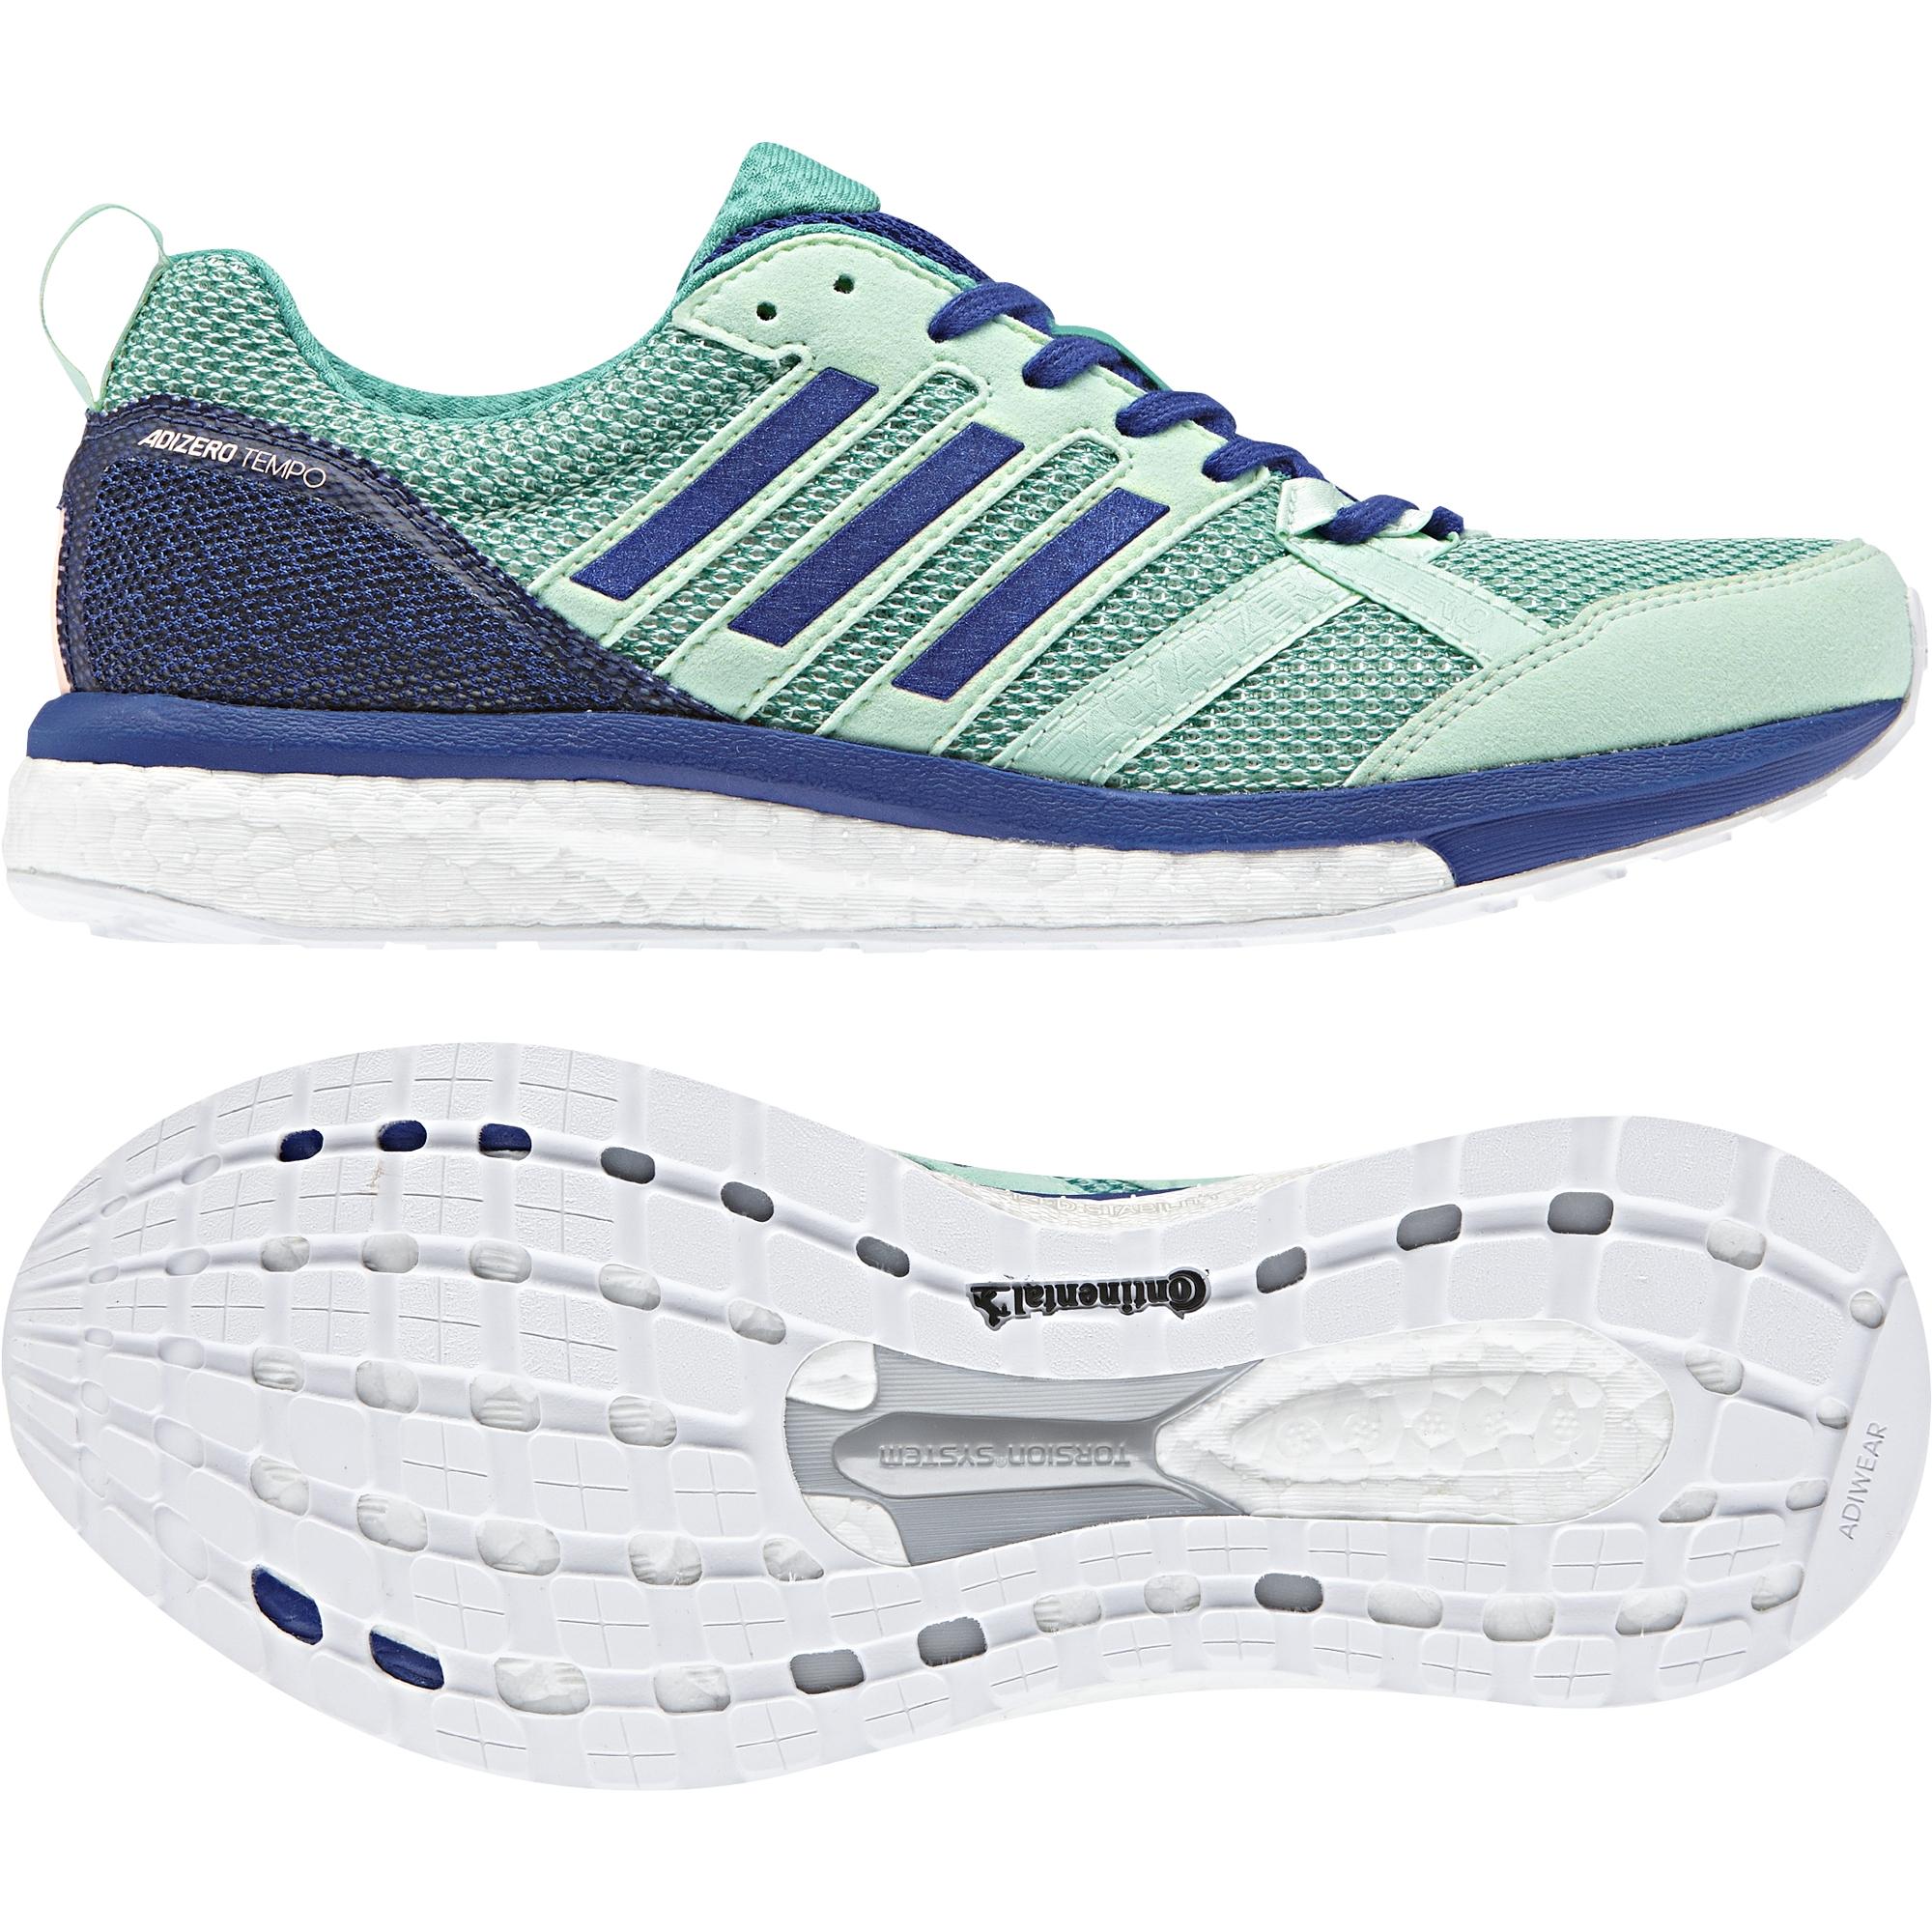 half off fa6c7 bebfd Chaussures femme adidas adizero tempo 9